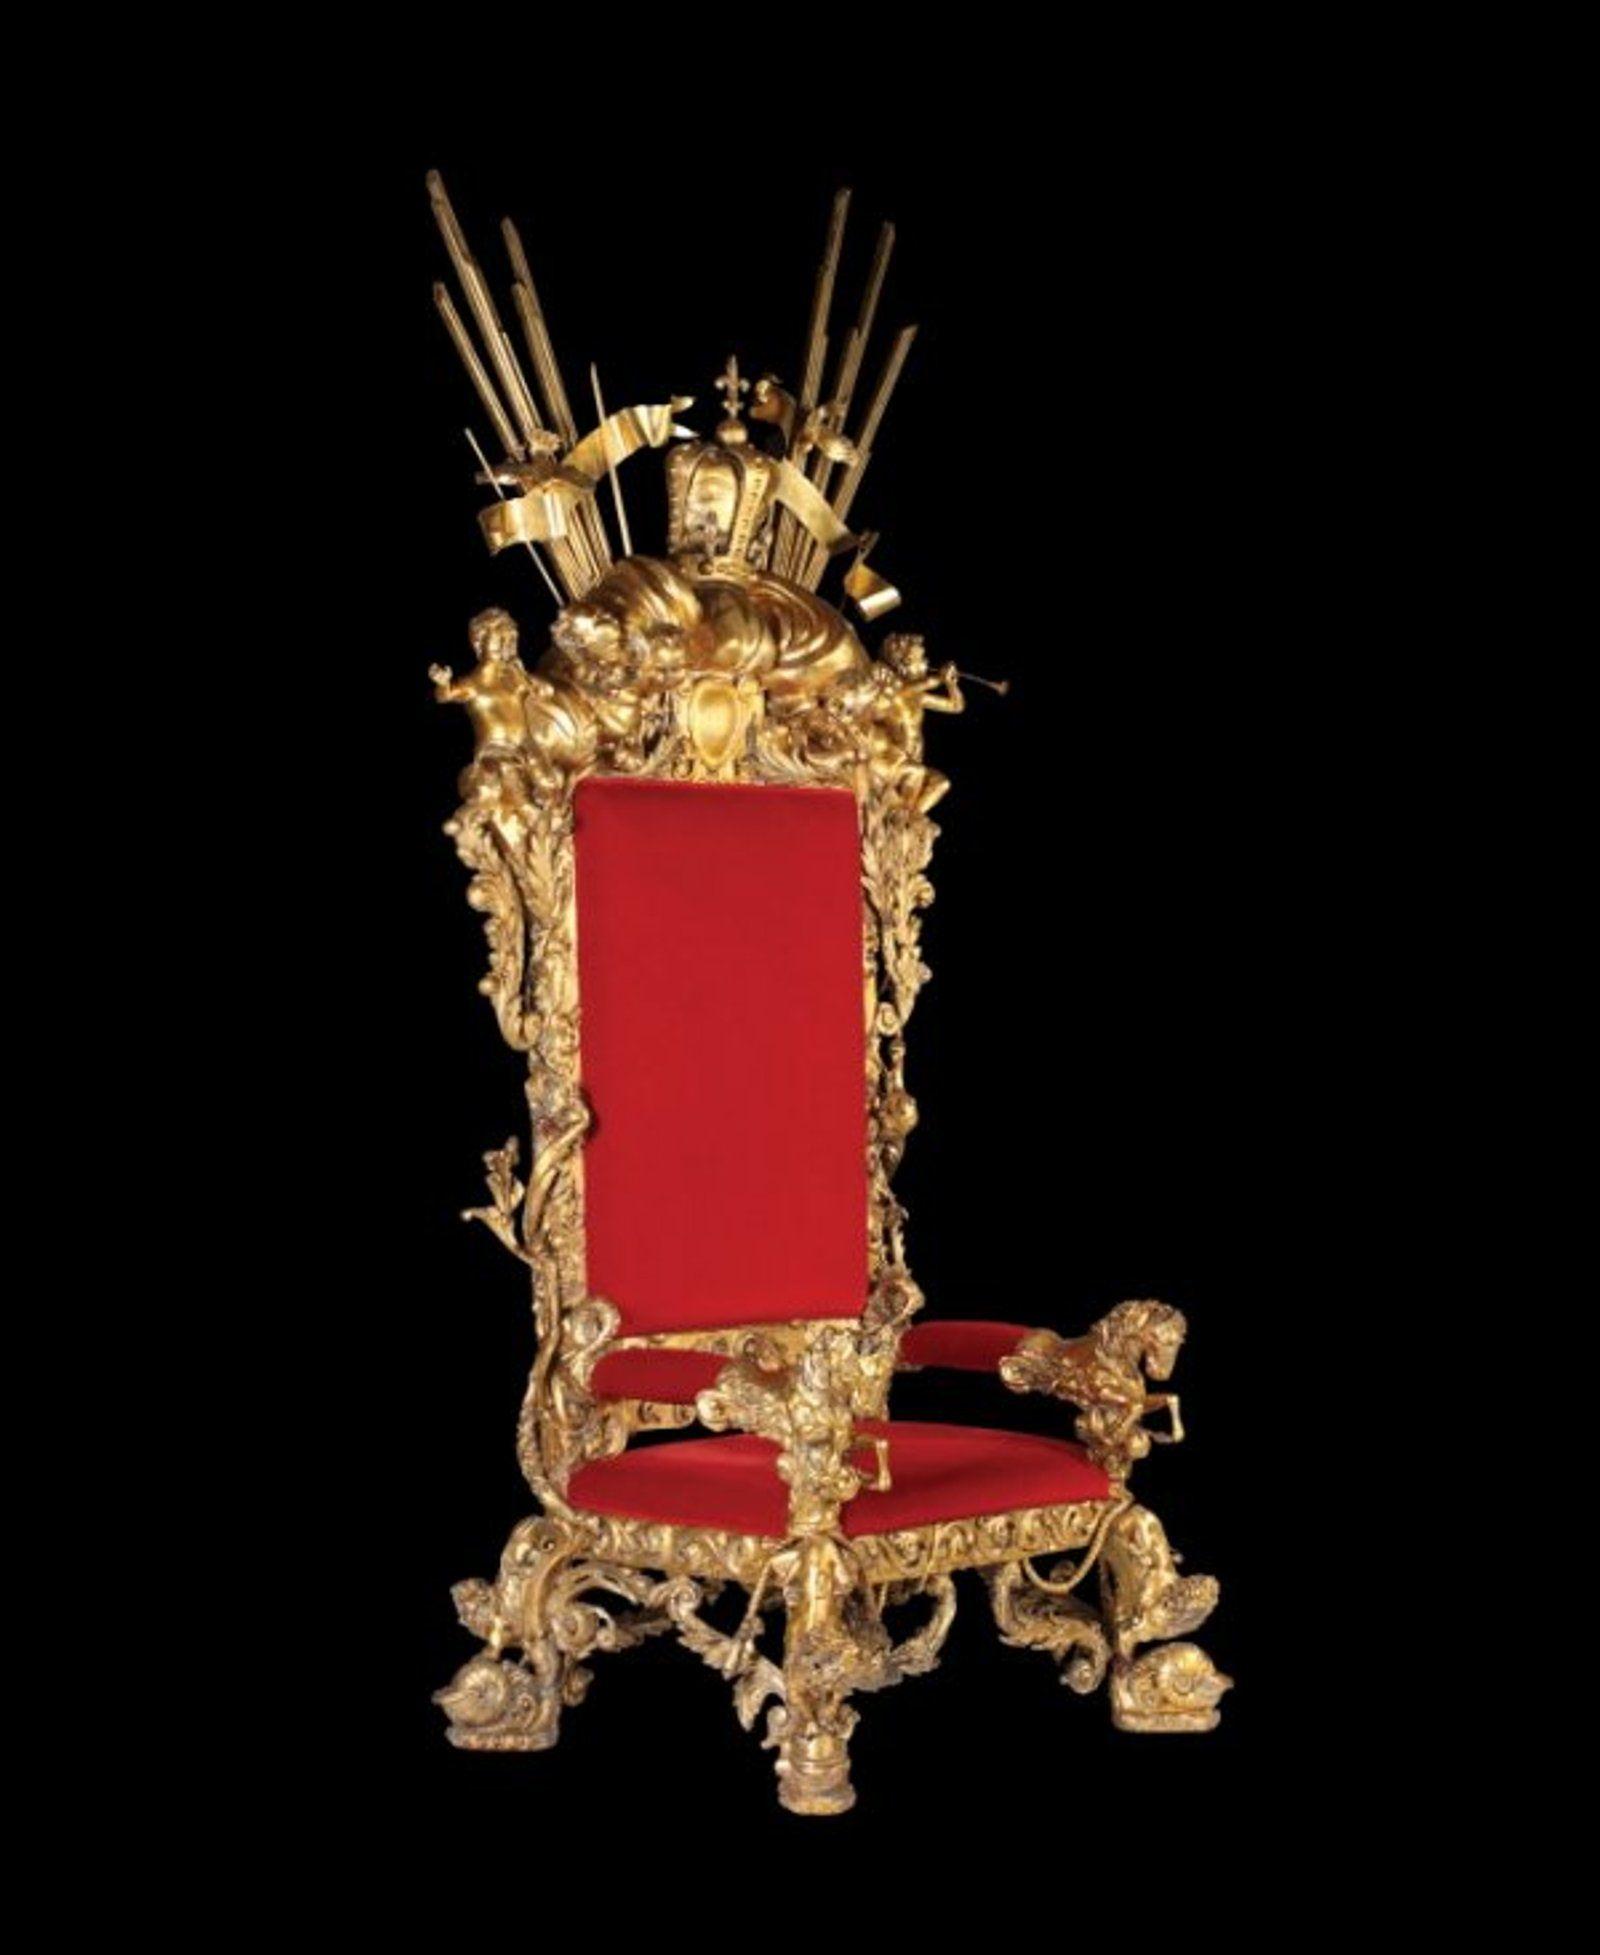 519 Monumental Gilded Throne In 2020 Art Decor Michael Jackson Art Chair